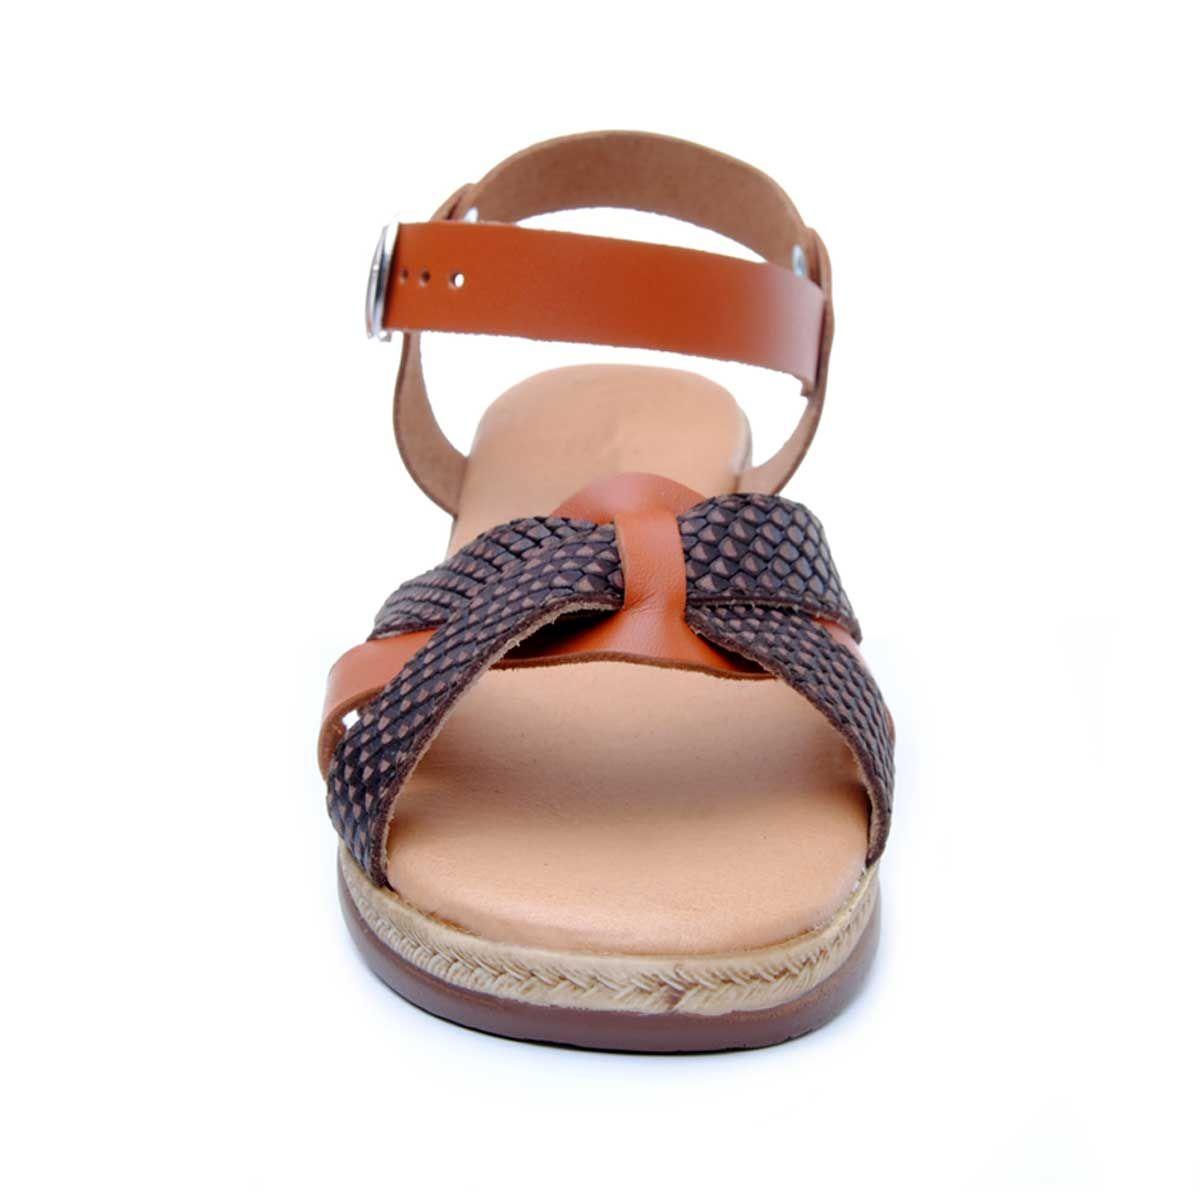 Purapiel Strappy Flat Sandal in Camel